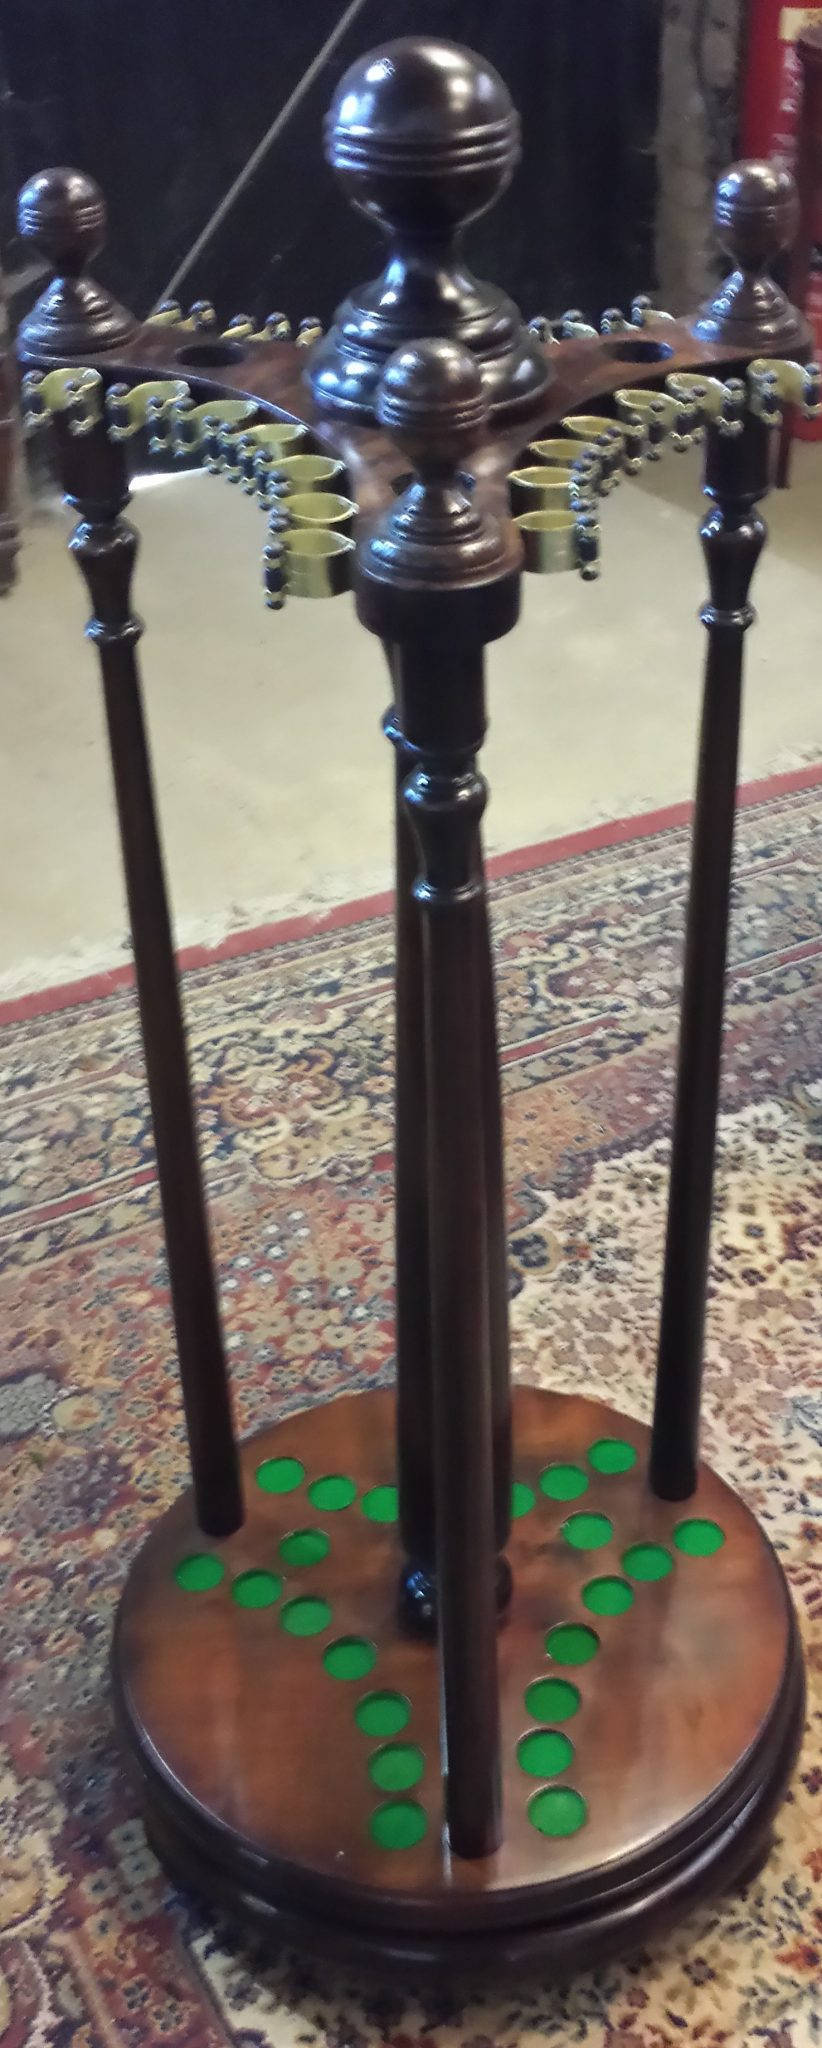 Restored Antique Revolving Cue Rack Browns Antiques